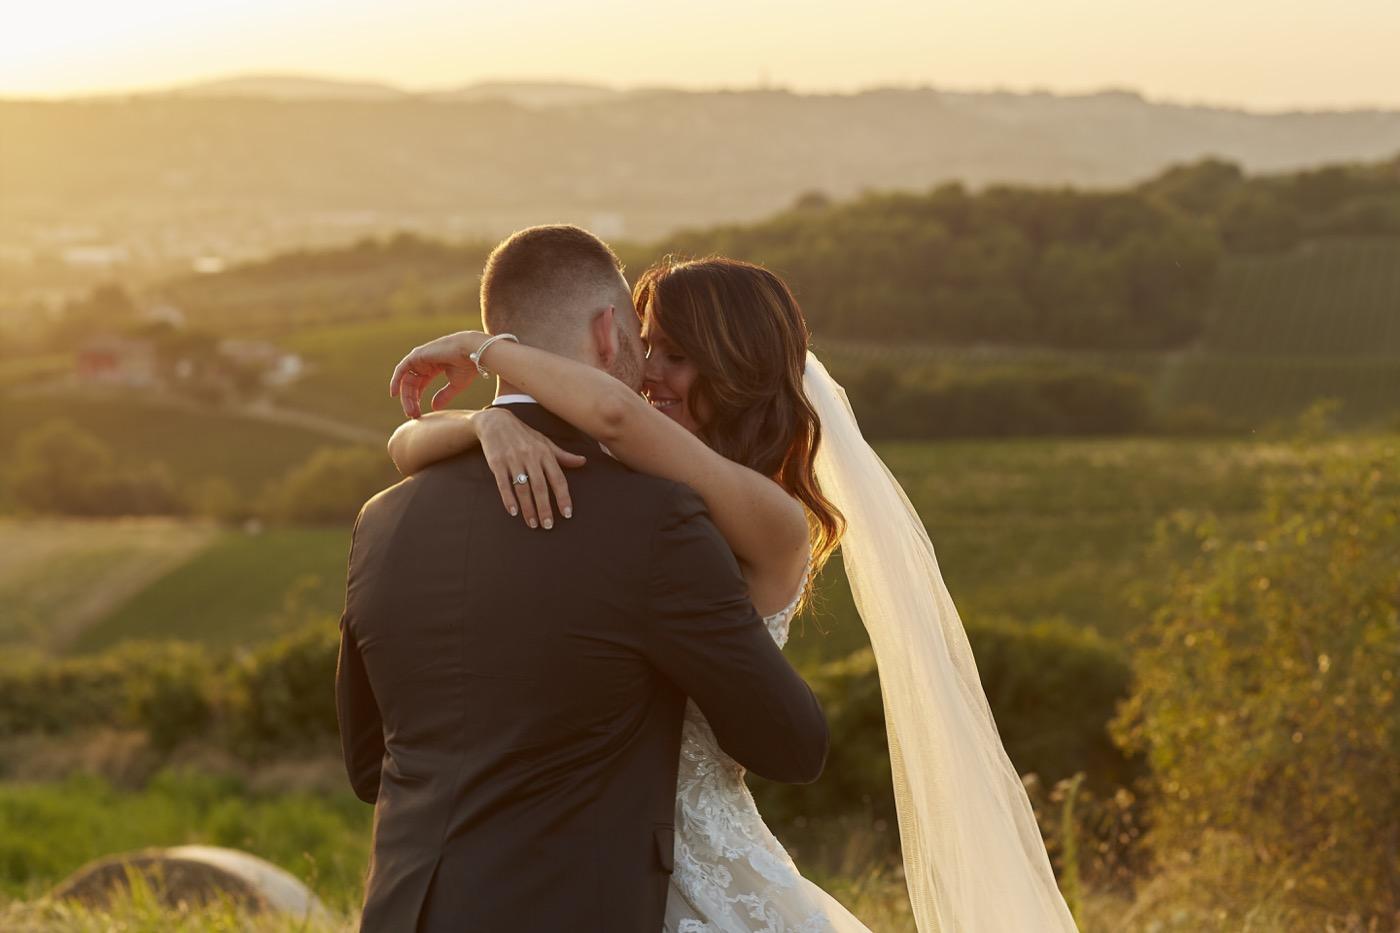 Claudio-Coppola-wedding-photographer-la-scuderia-eventi-preparativi-la-rosetta-perugia-79